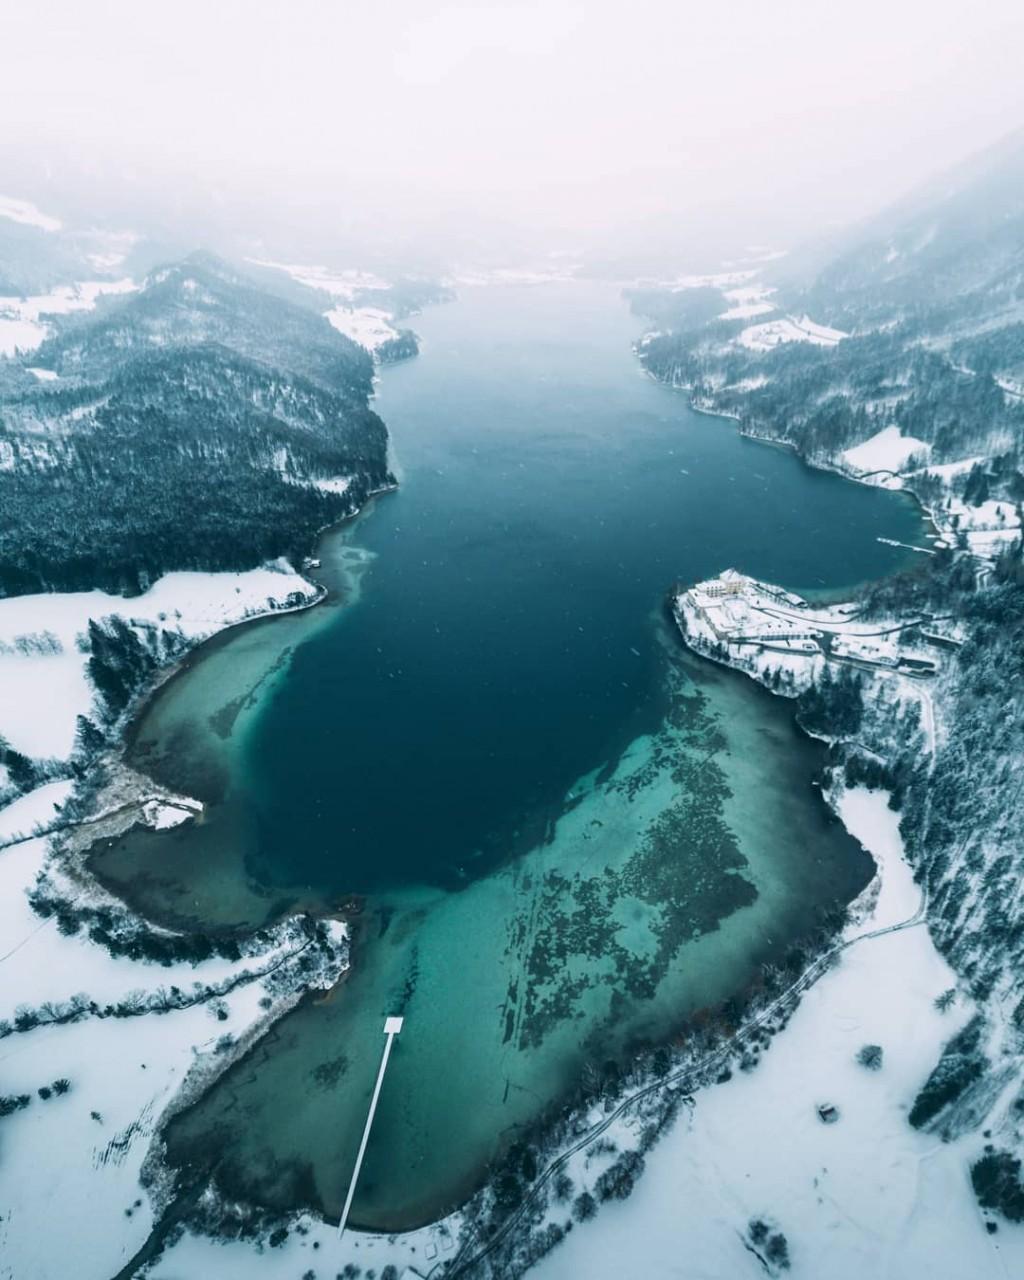 Зимняя Австрия на снимках Себастьяна Шейхла австрия